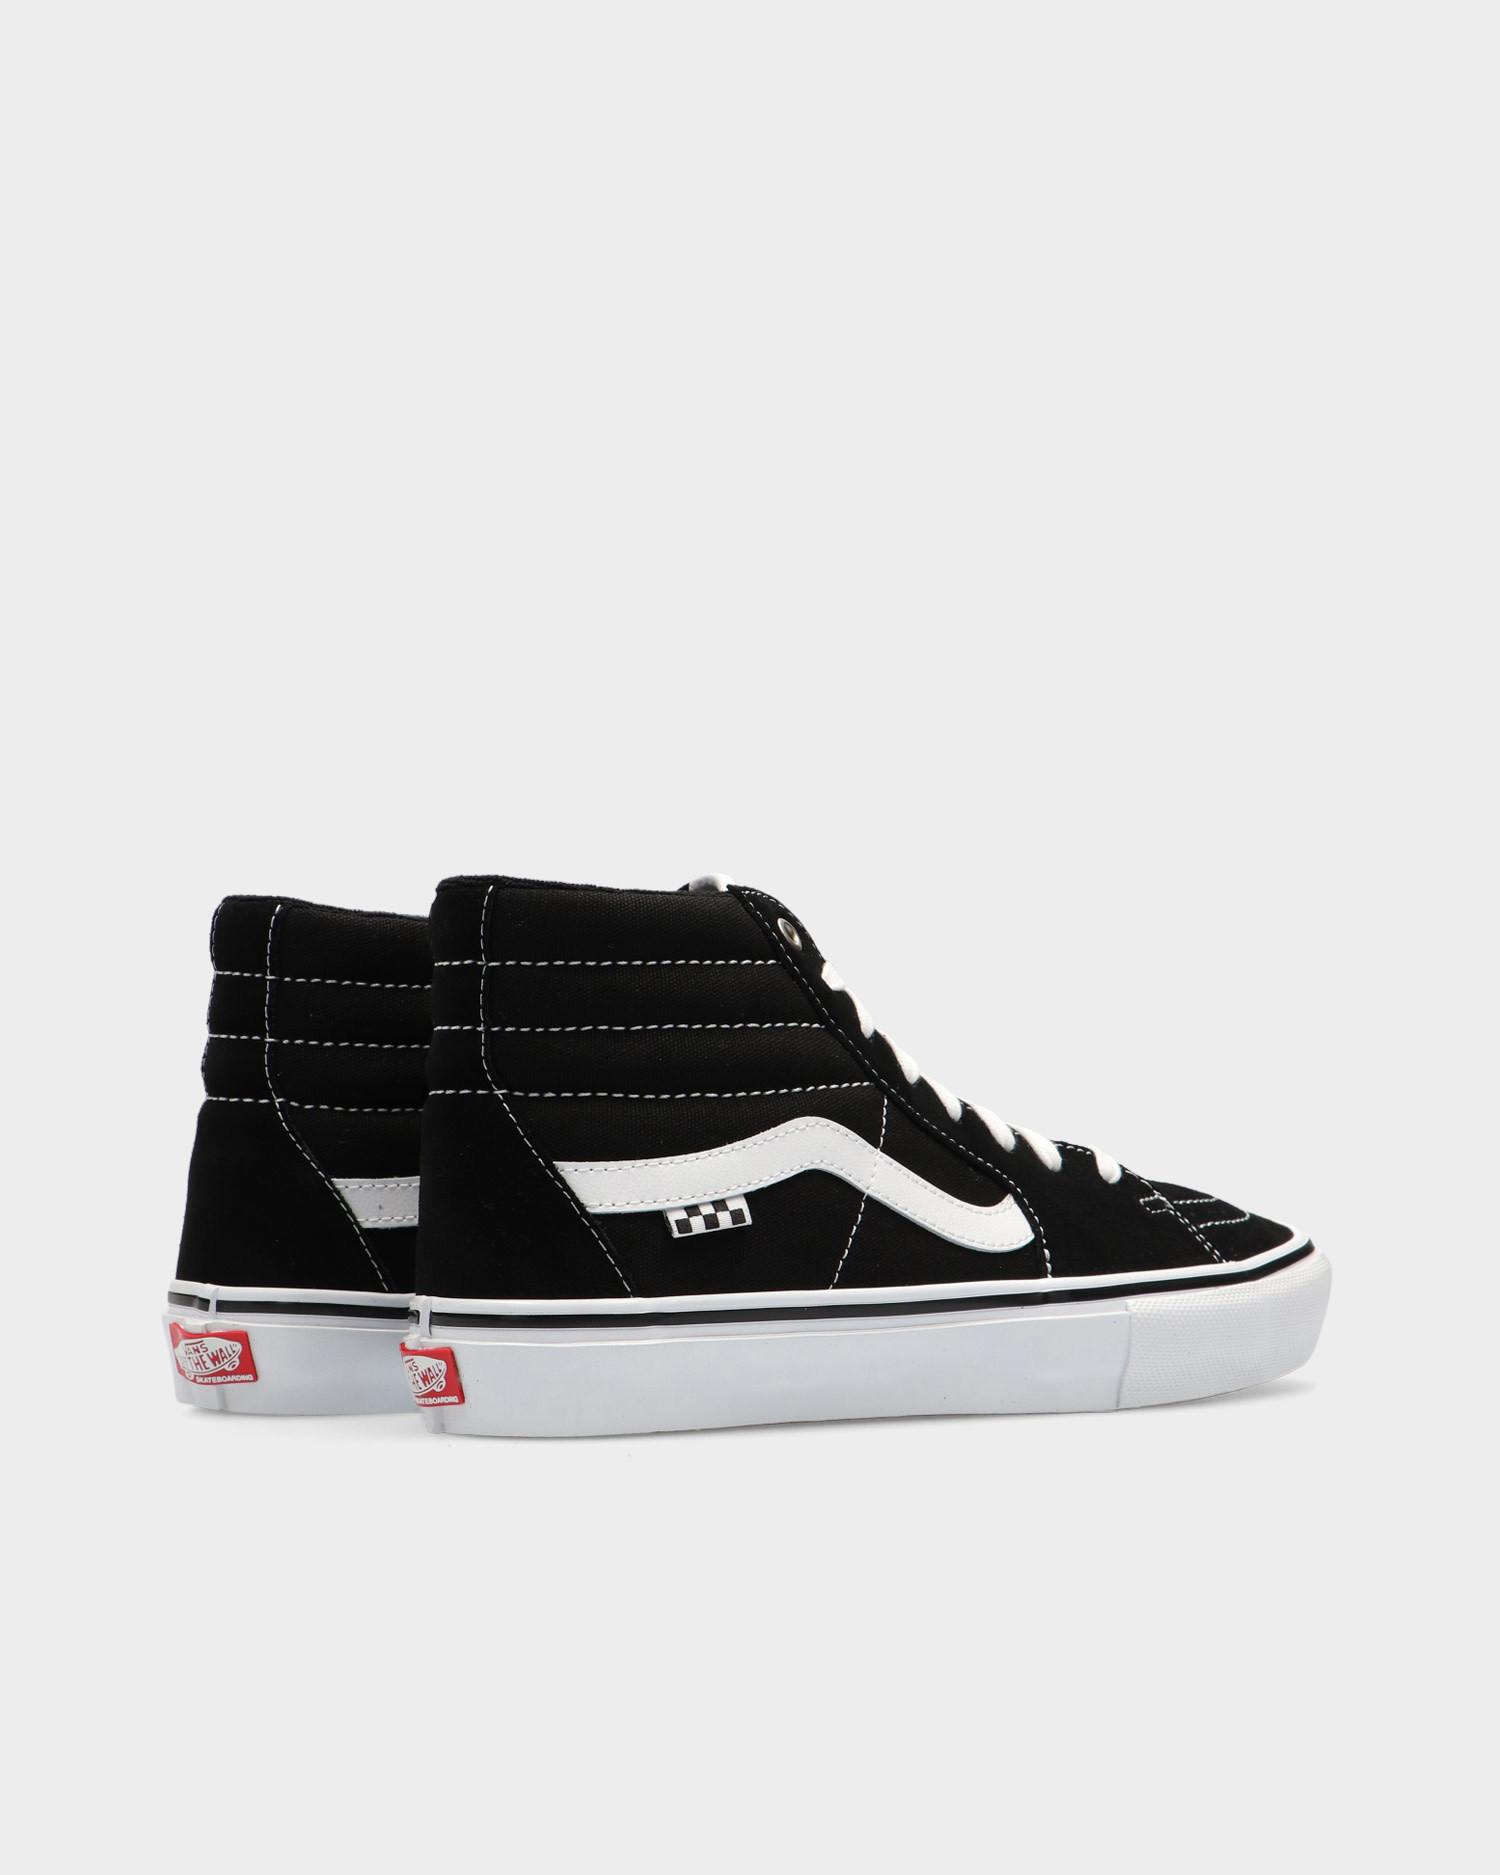 Vans SK8-HI Skate Classic Black/White